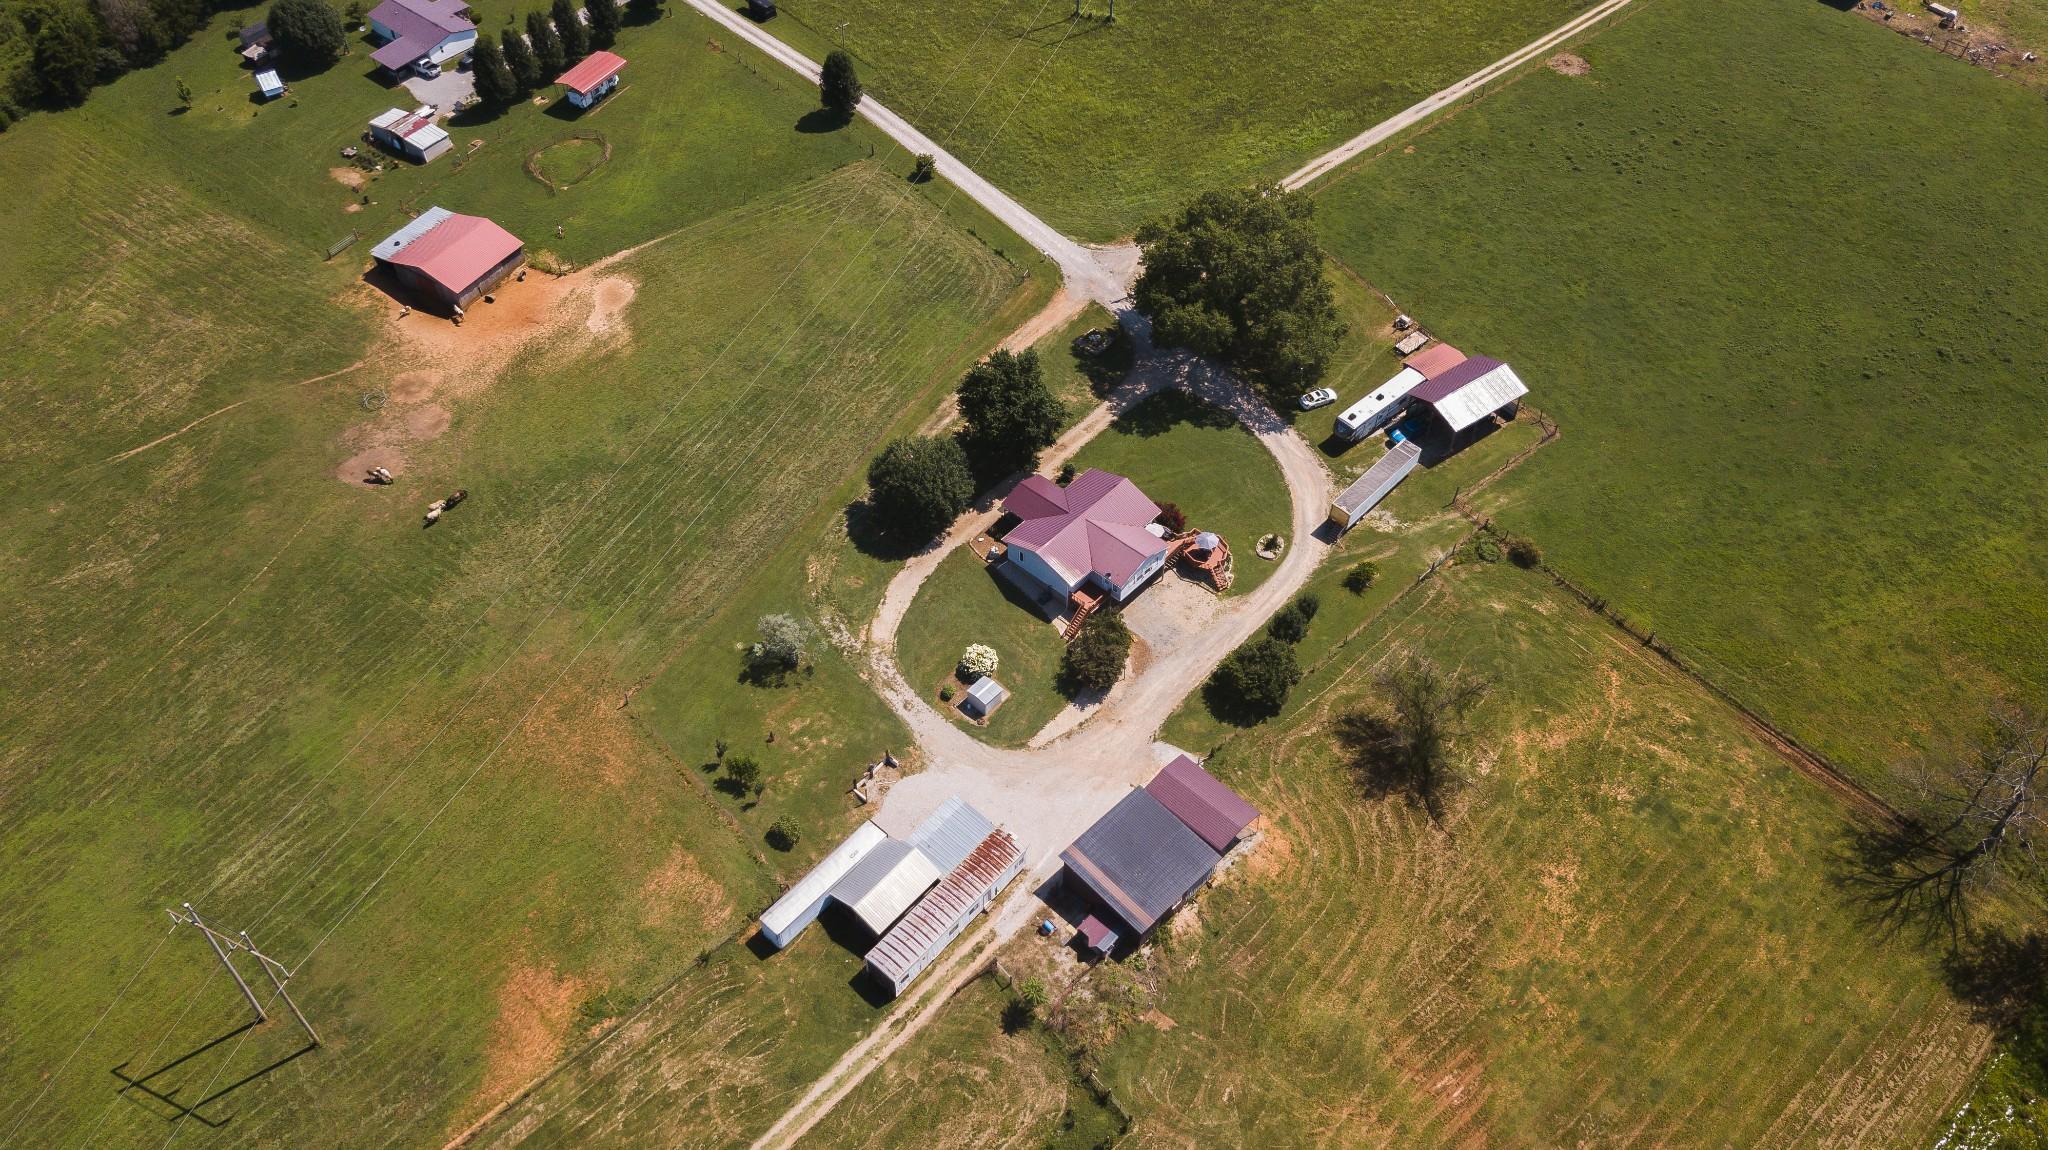 324 Laster Holman RD Property Photo - Decherd, TN real estate listing